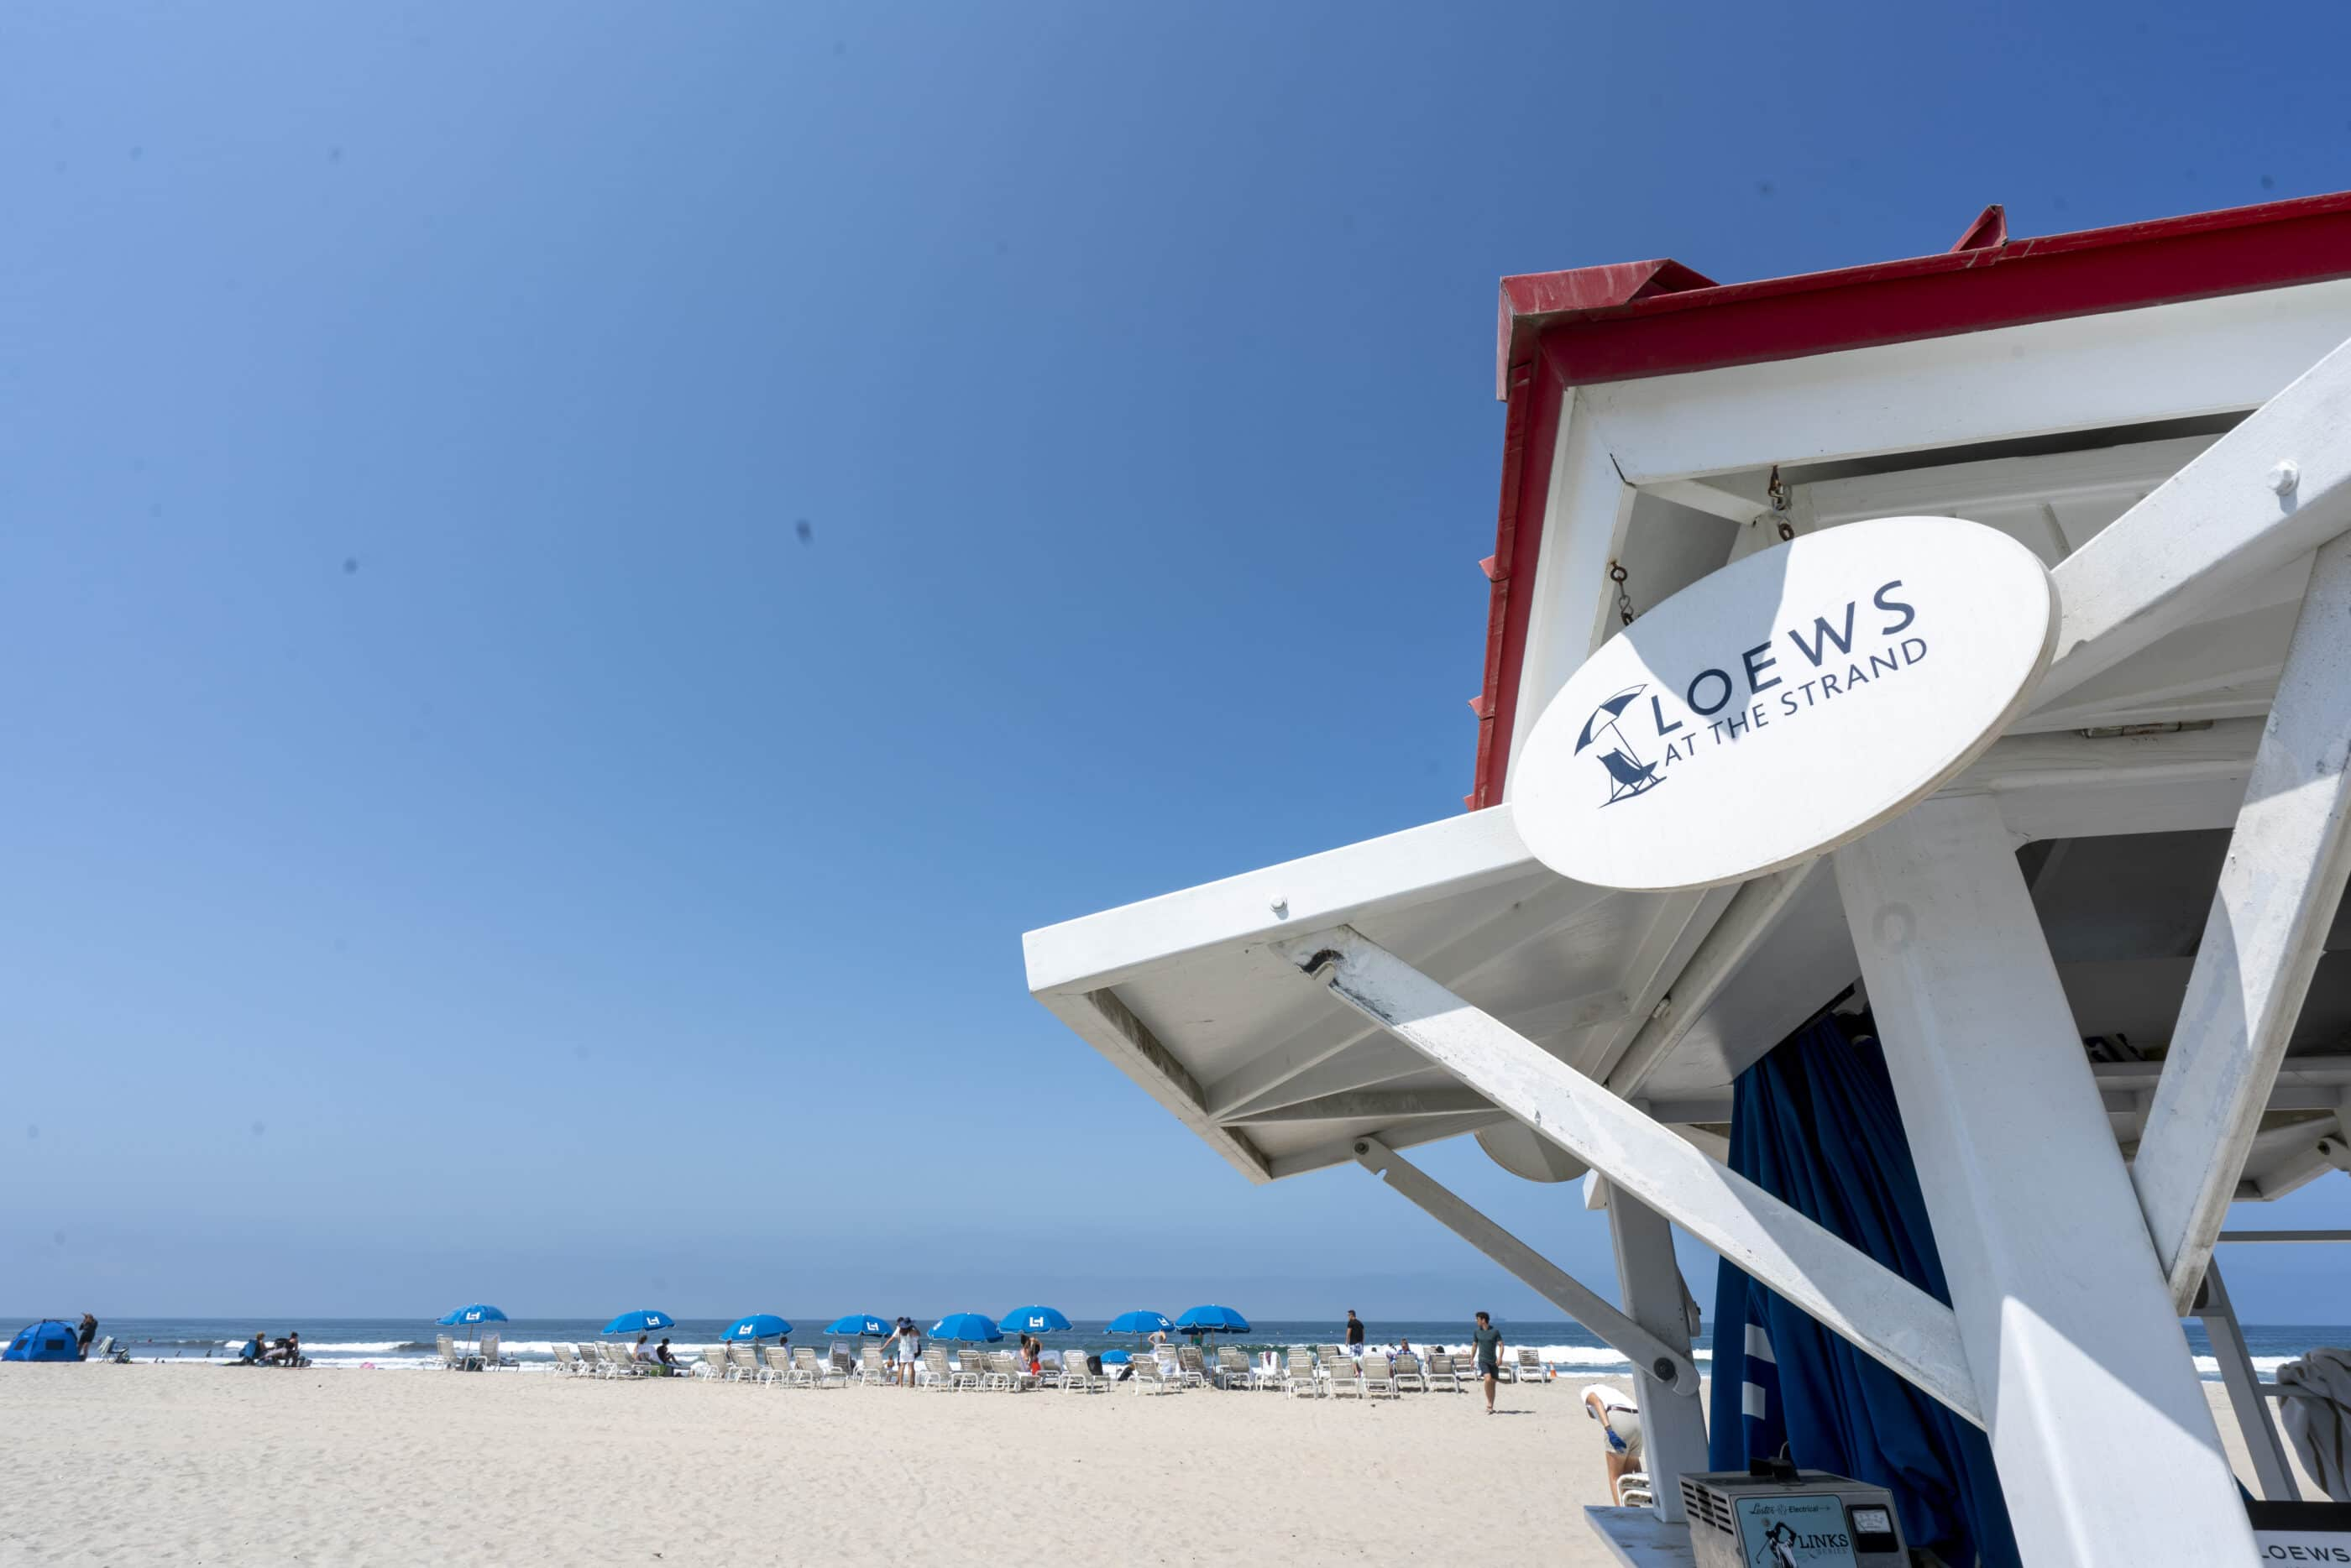 The Loews at the Strand beach service kiosk on Silver Strand State Beach.